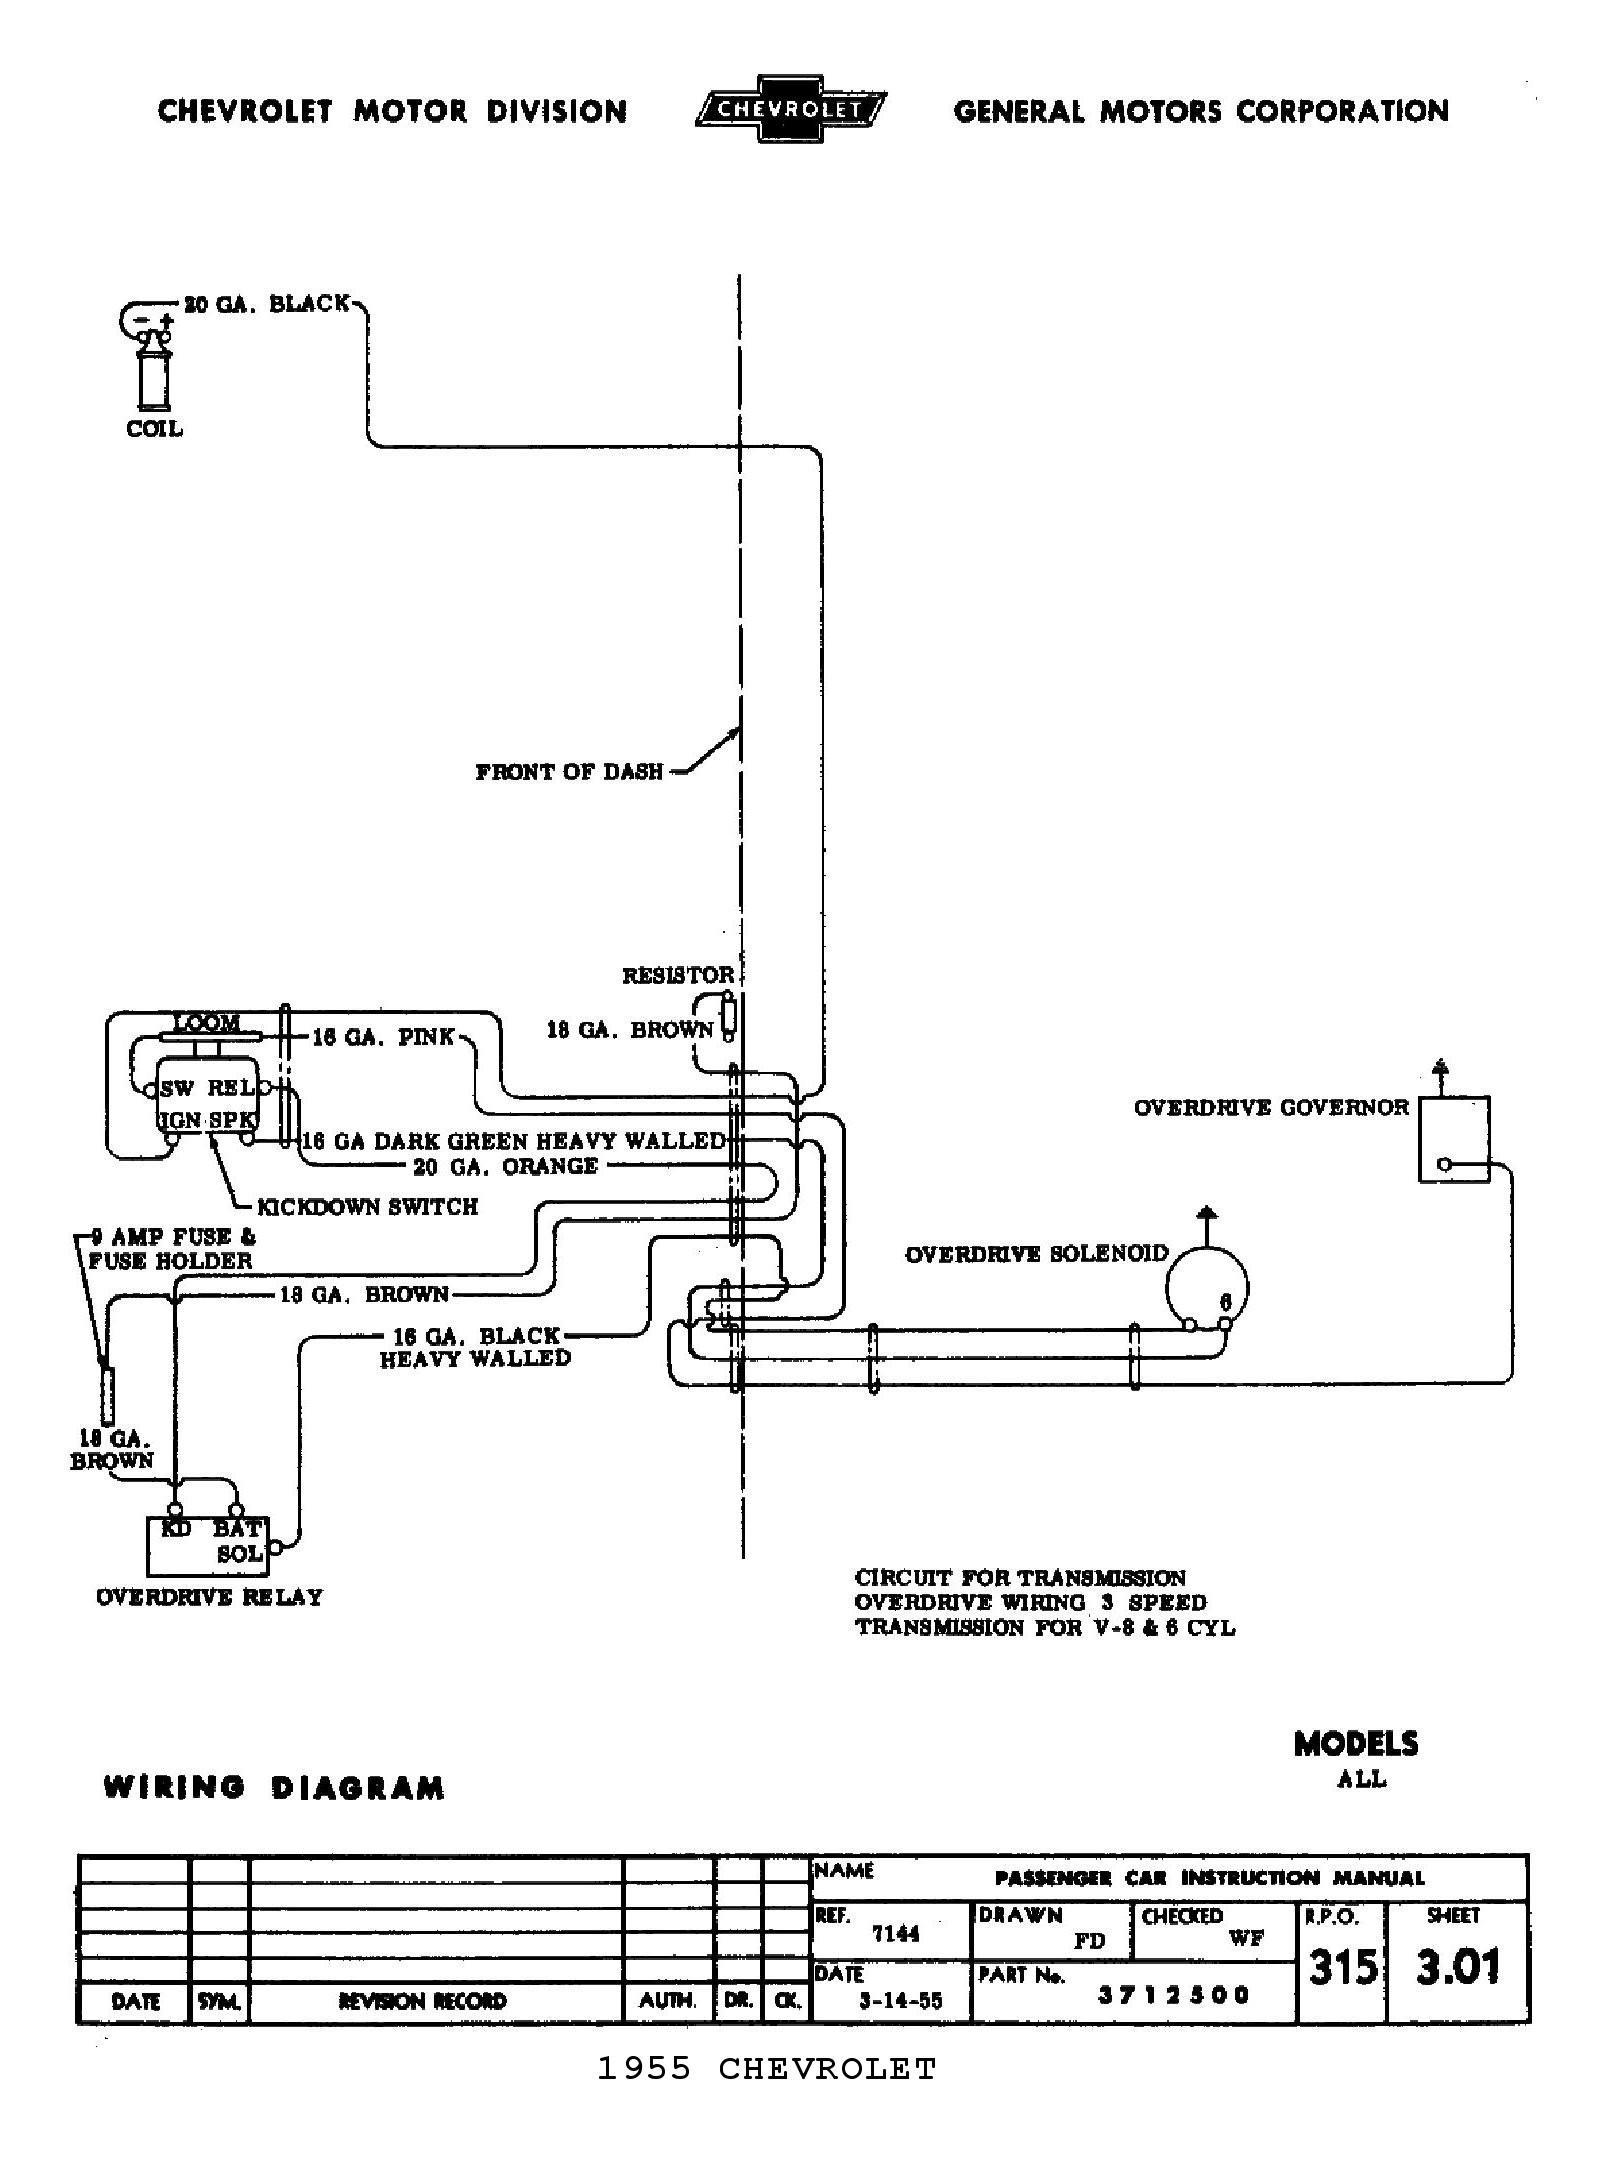 55 chevy ididit wiring diagram data wiring diagram55 chevy wiring wiring  diagram ididit steering column wiring